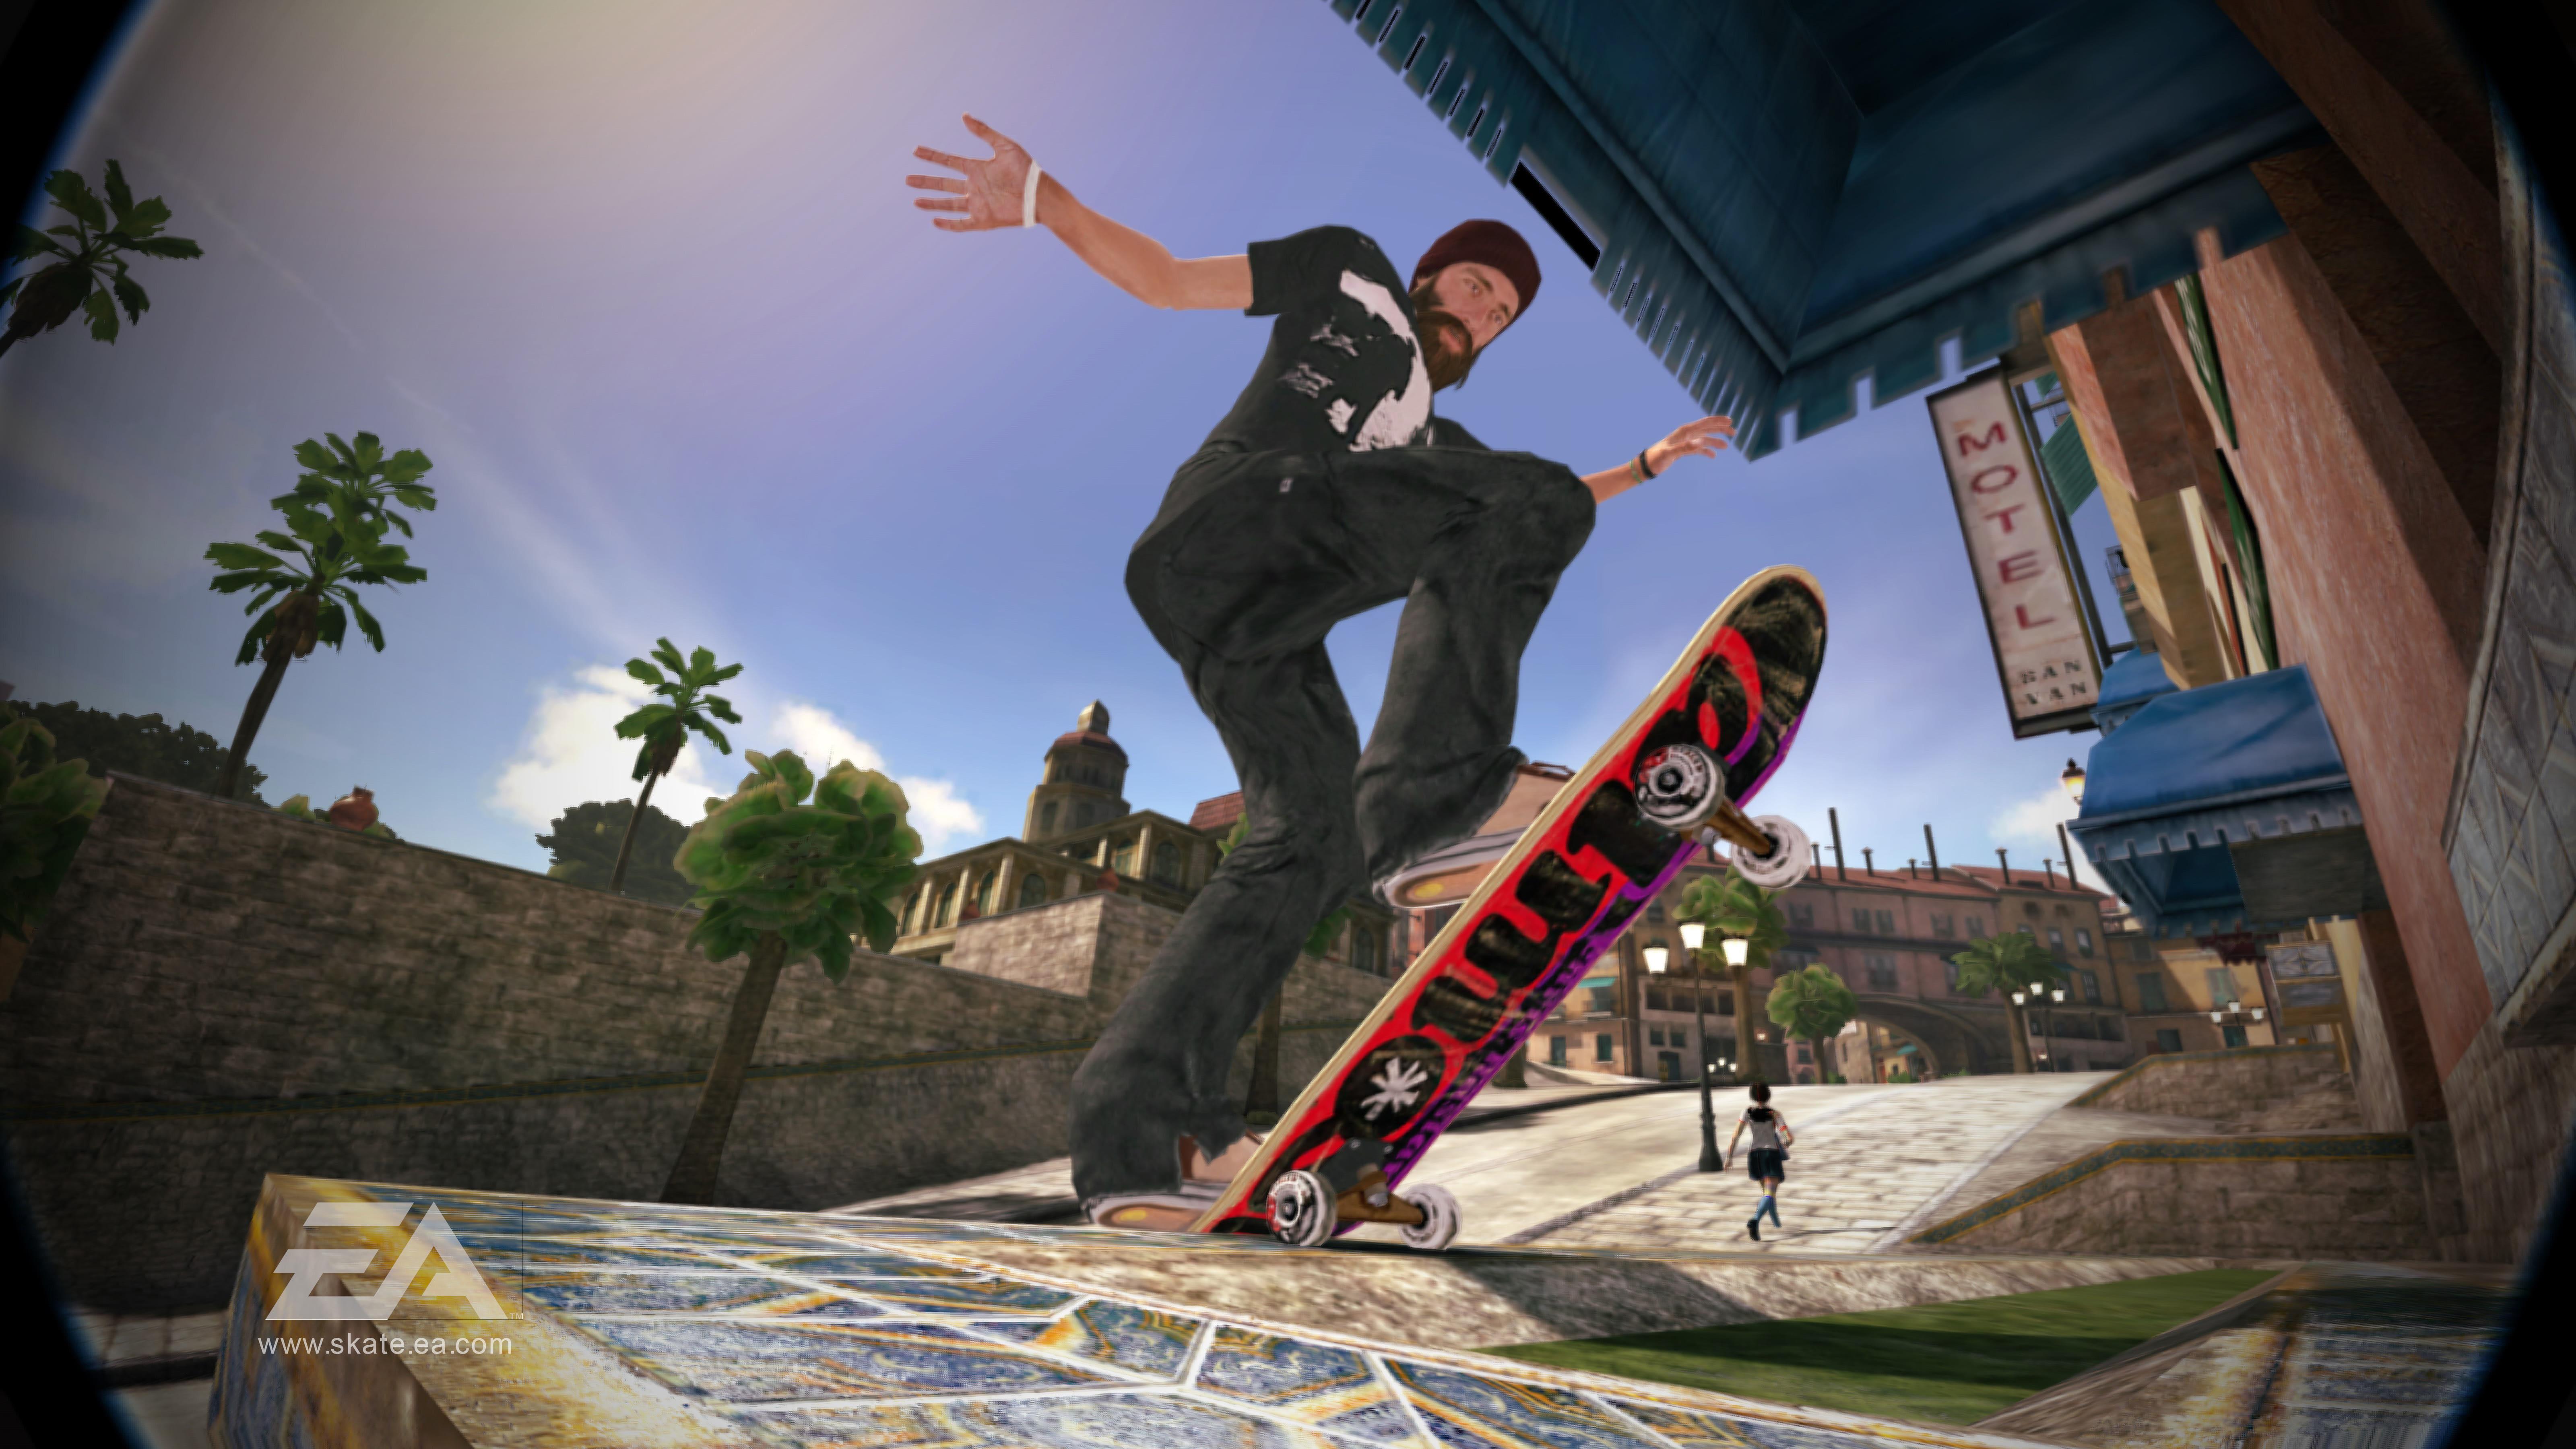 Skate 4 kan bli open world och få multiplayer, enligt ny trailer